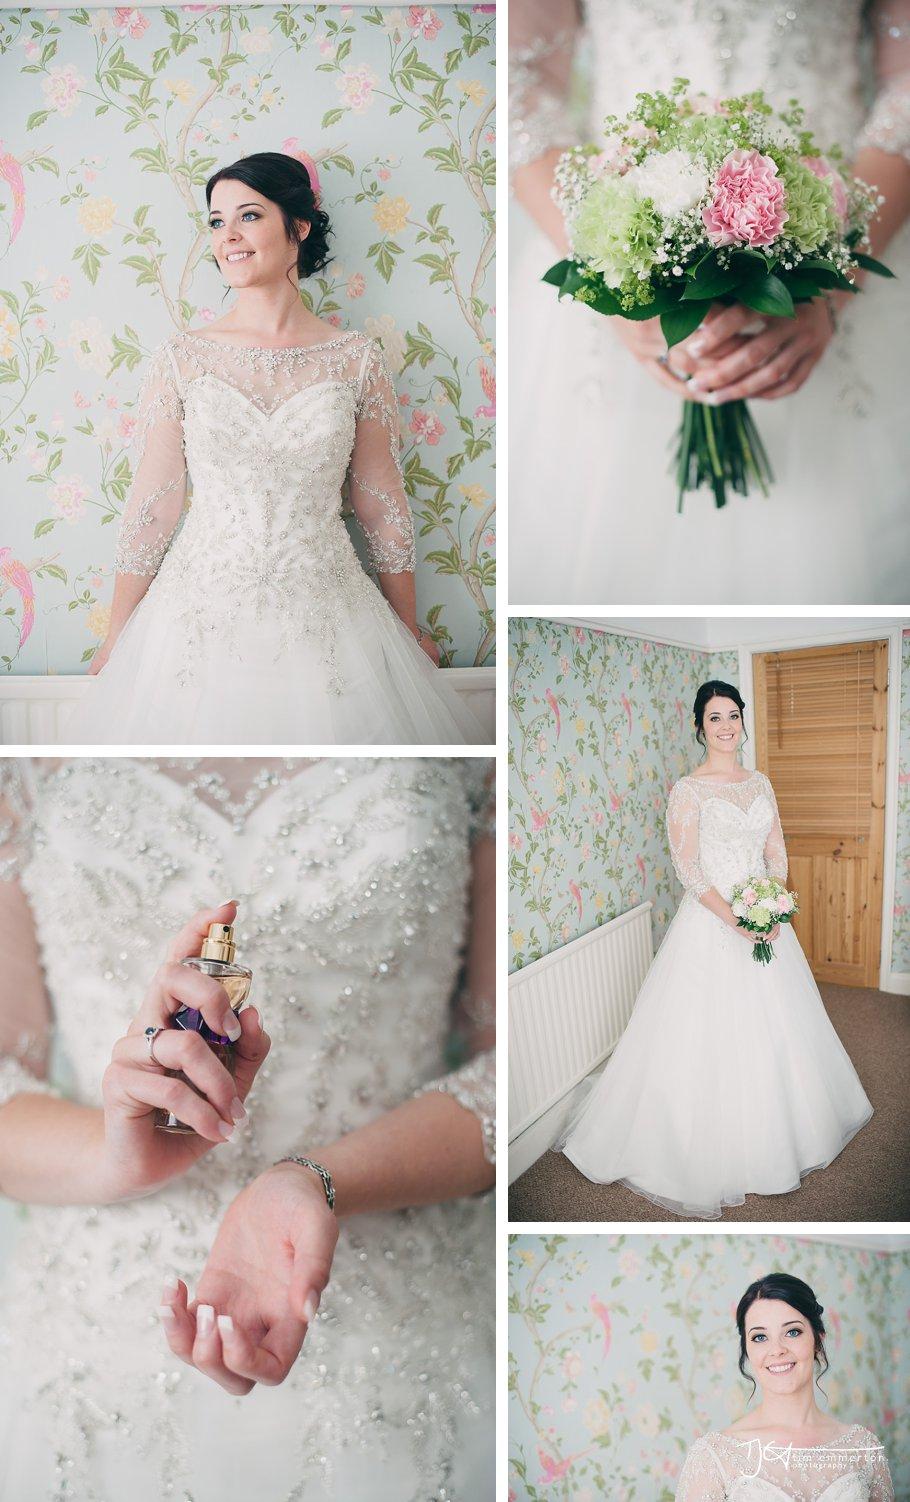 Farington-Lodge-Wedding-Photographer-023.jpg